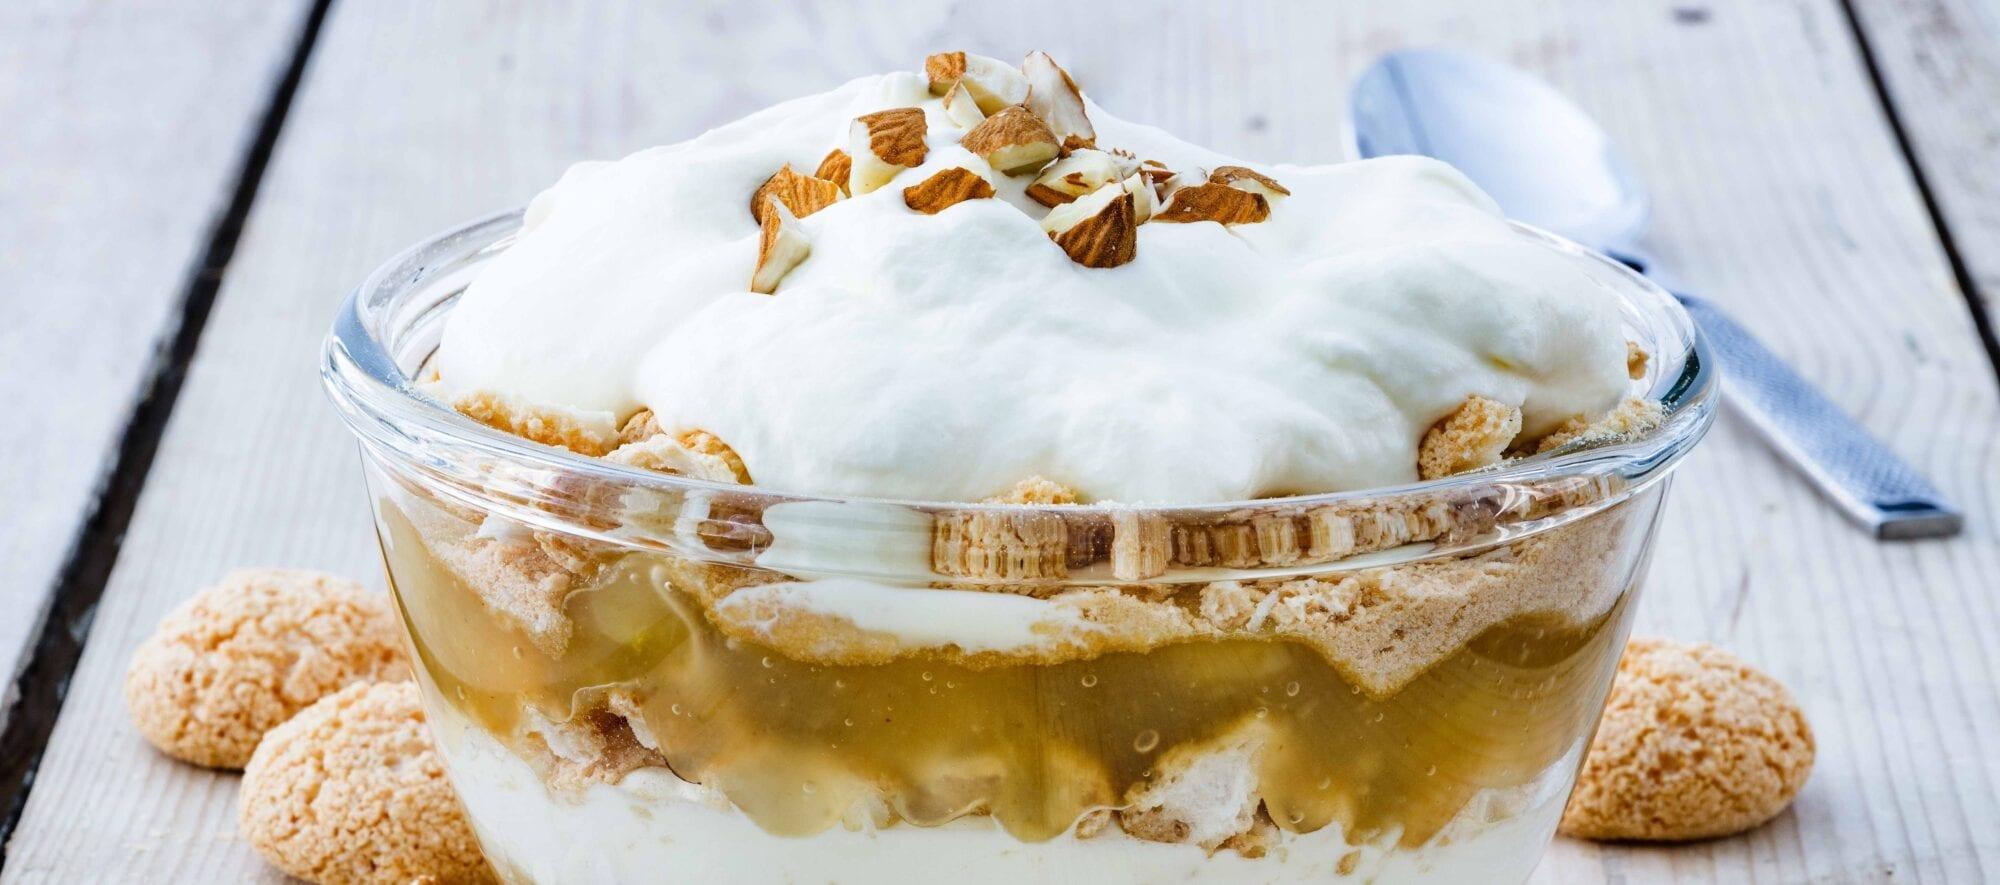 Gammeldags æblekage med makroner, flødeskum og æblestykker kan laves på 10 minutter